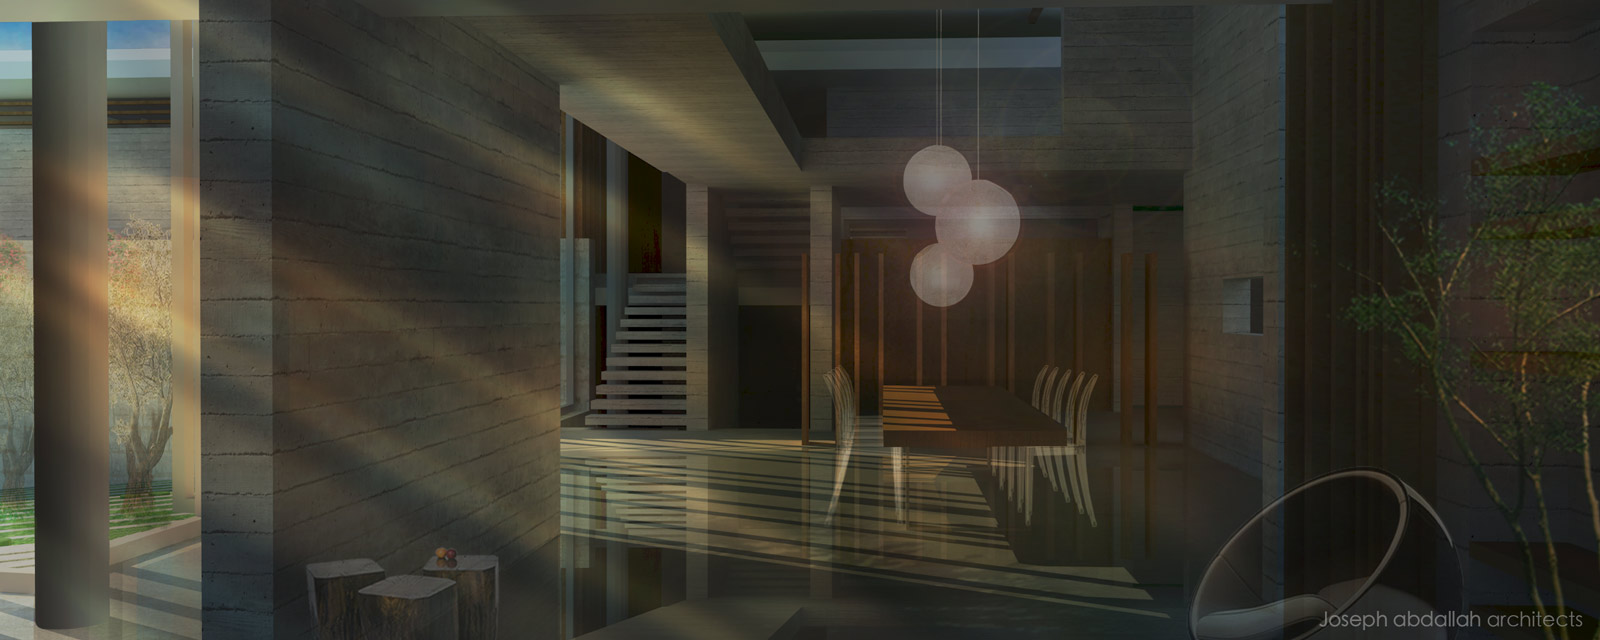 bakhos-nassif-mirror-pool-villa-lebanon-joseph-abdallah-architects-5